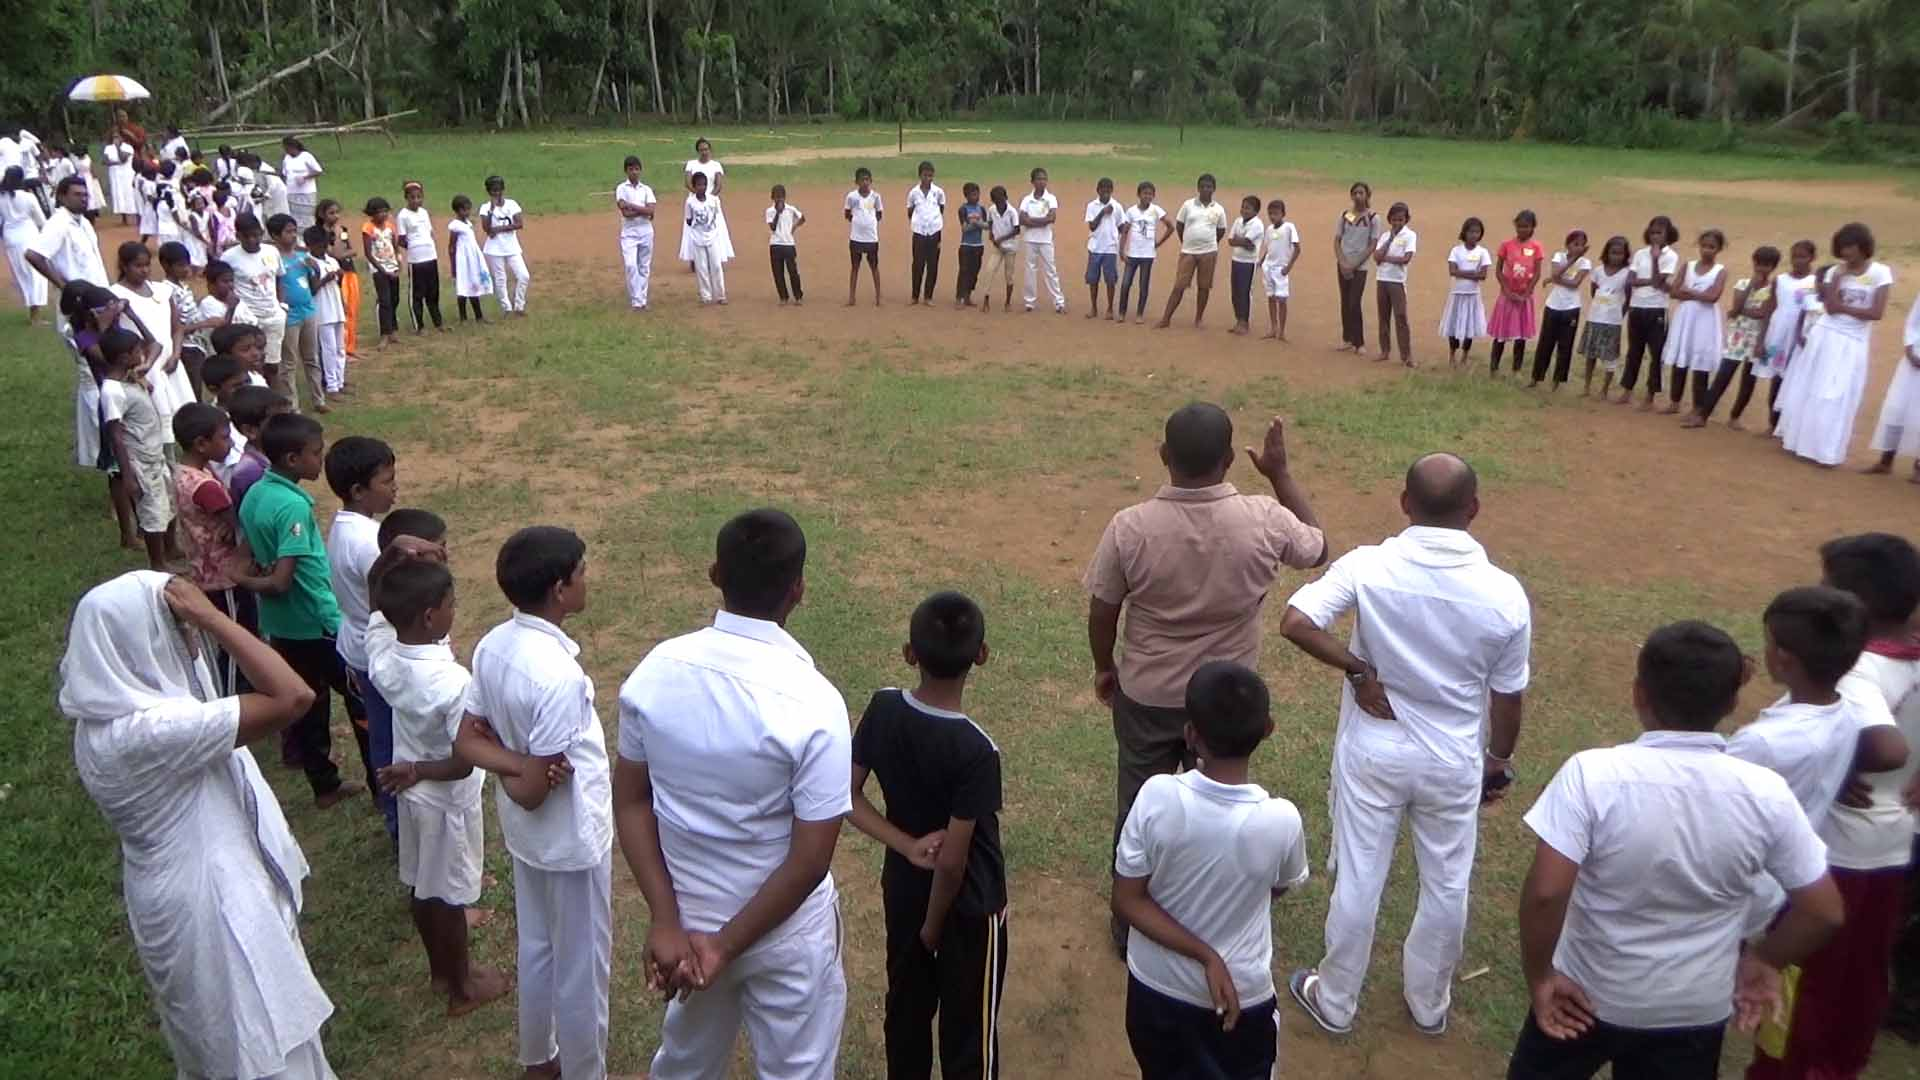 Sati Pasala Mindfulness Camp at Meethirigala Kanishta Vidyalaya-scouting activities (8)